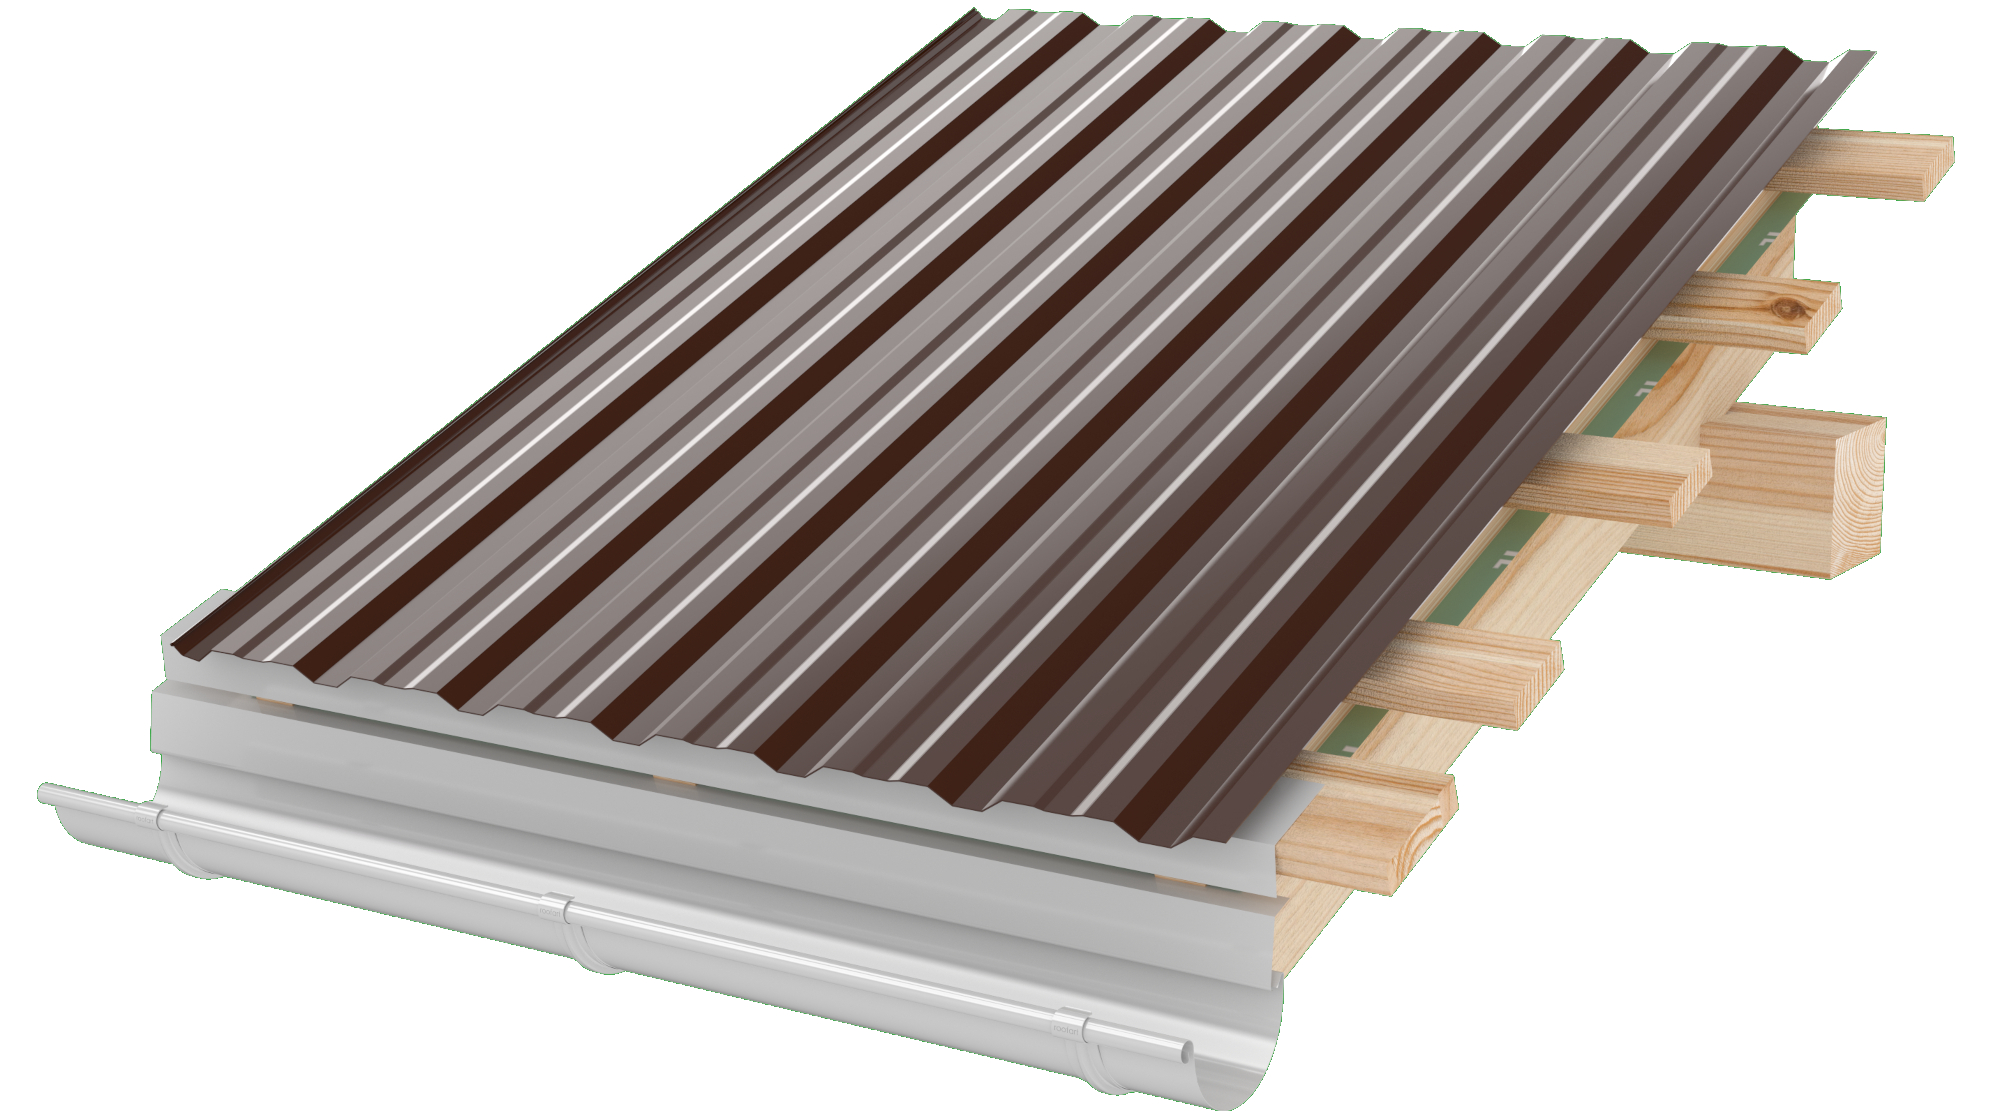 Tabla cutata RoofArt cuta 18mm